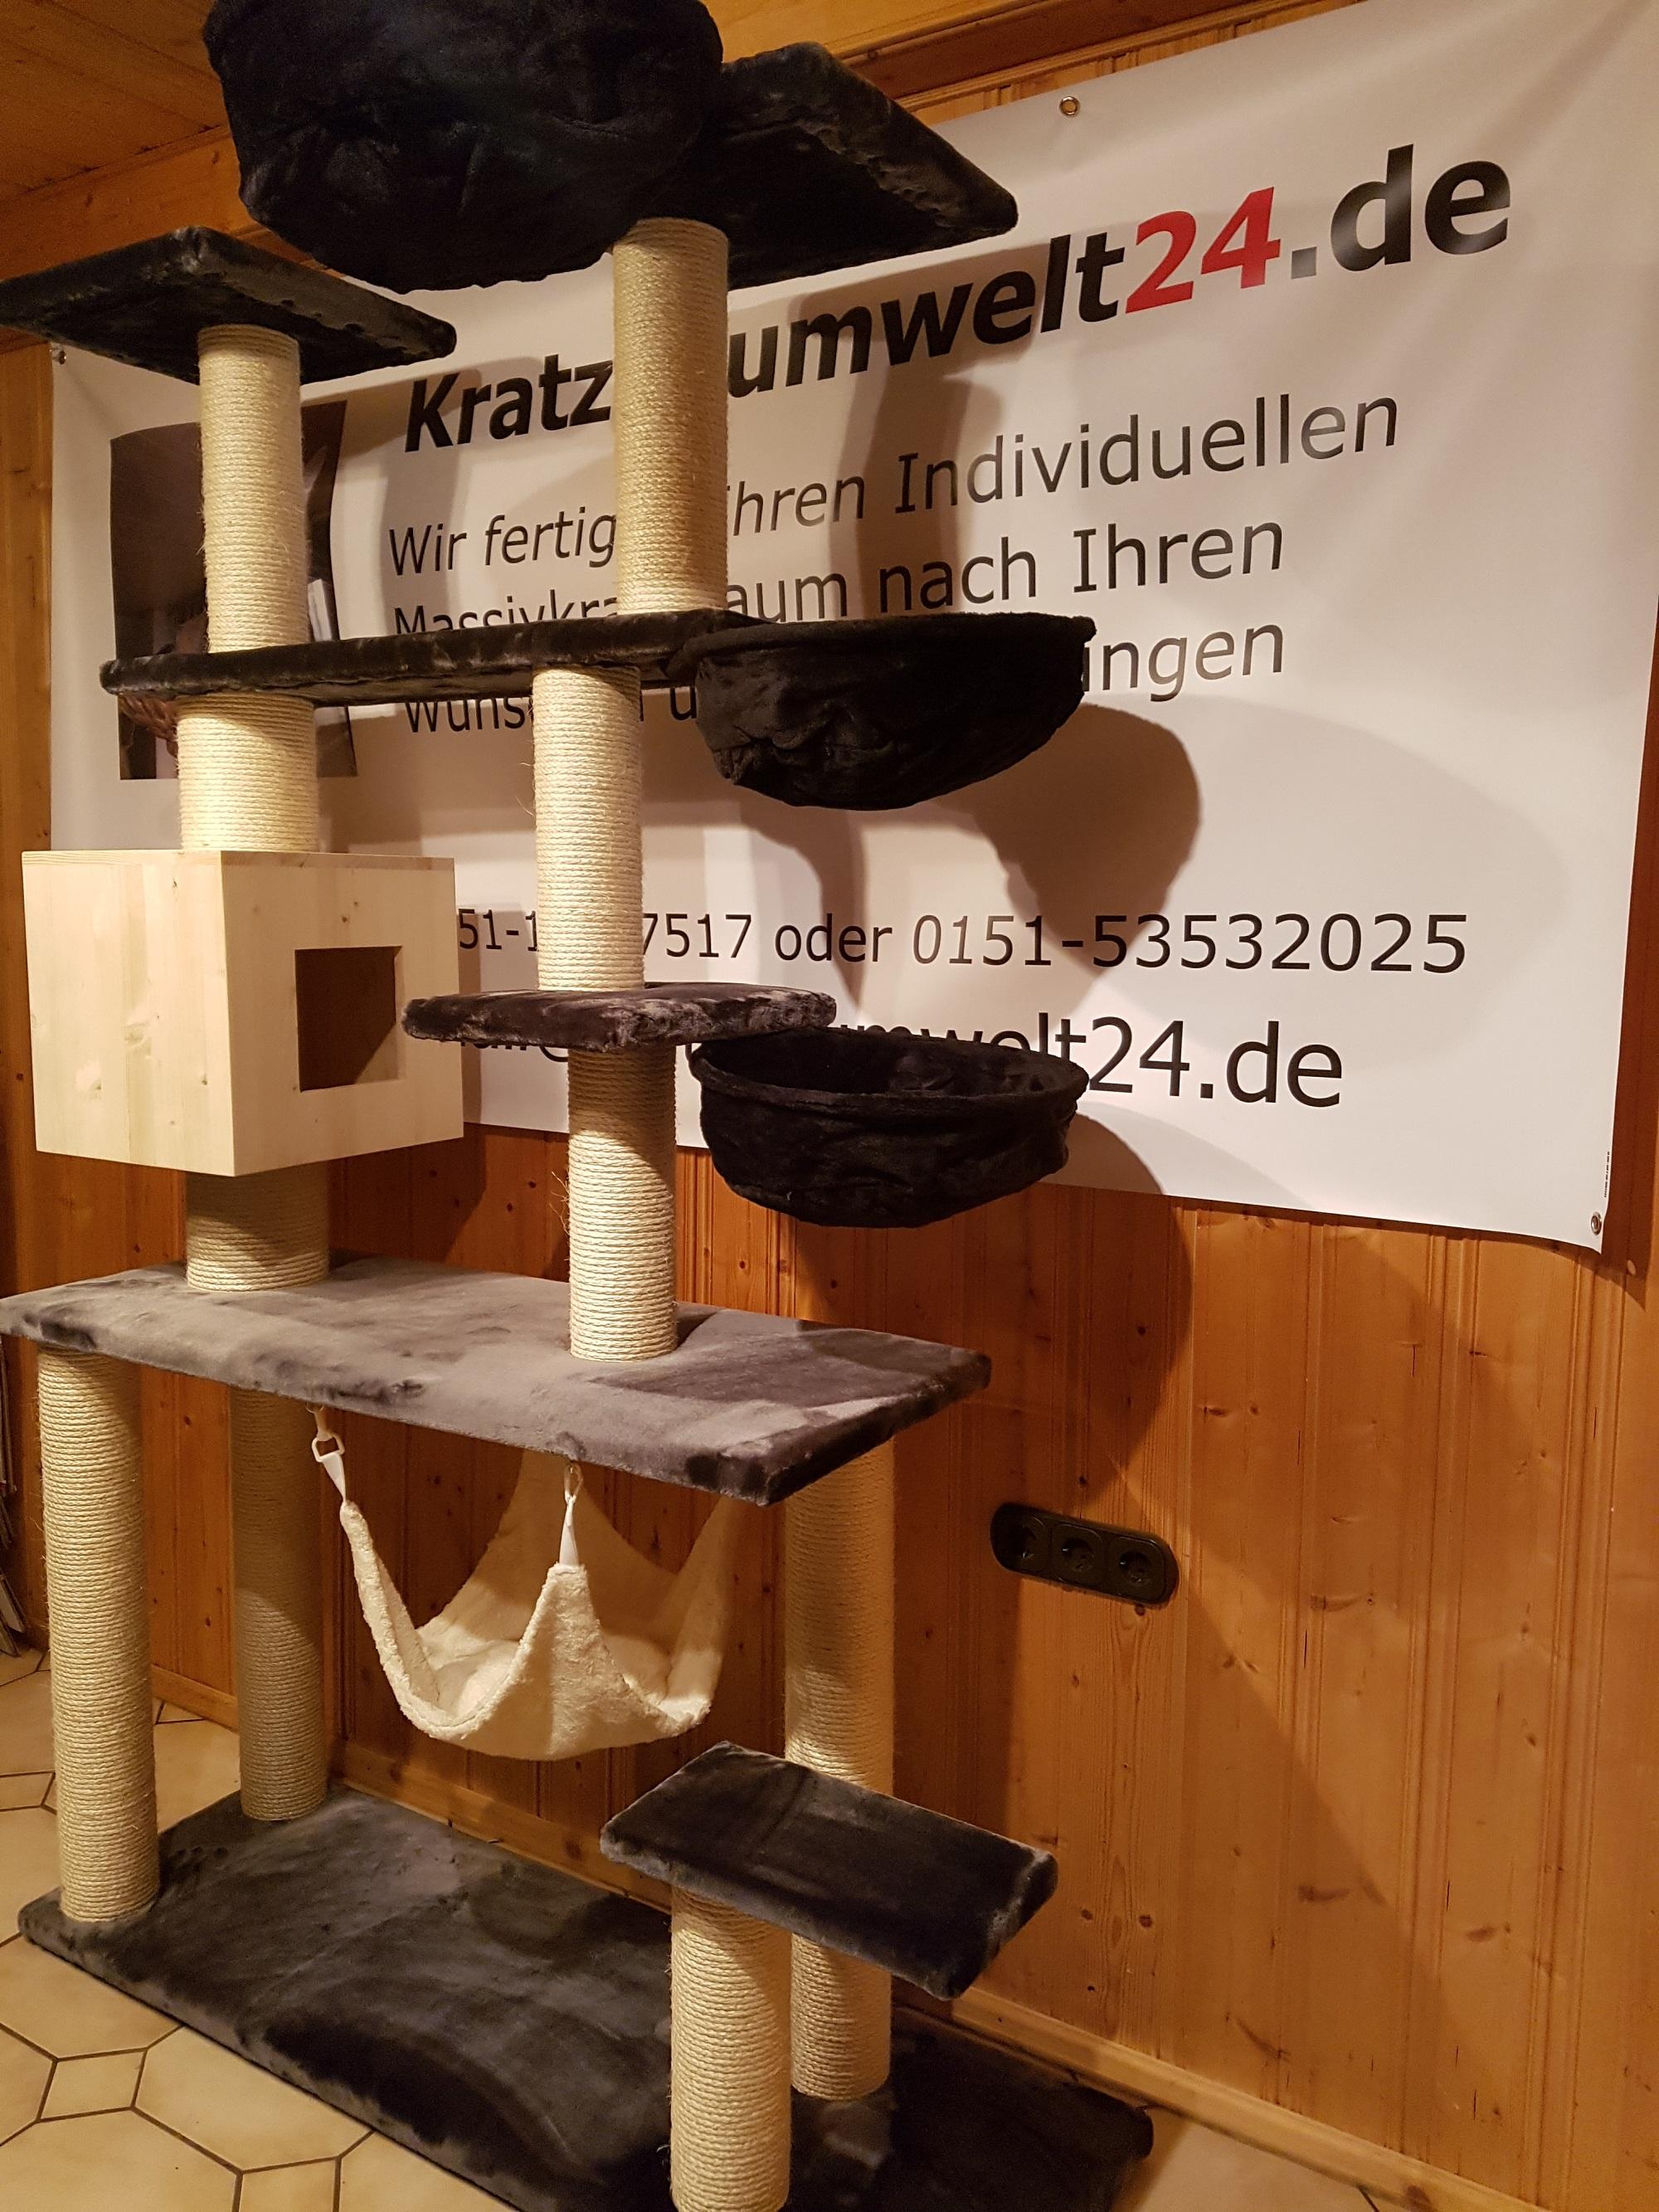 kratzb ume f r katzen massiv stabil fummelbrett liegemulde. Black Bedroom Furniture Sets. Home Design Ideas